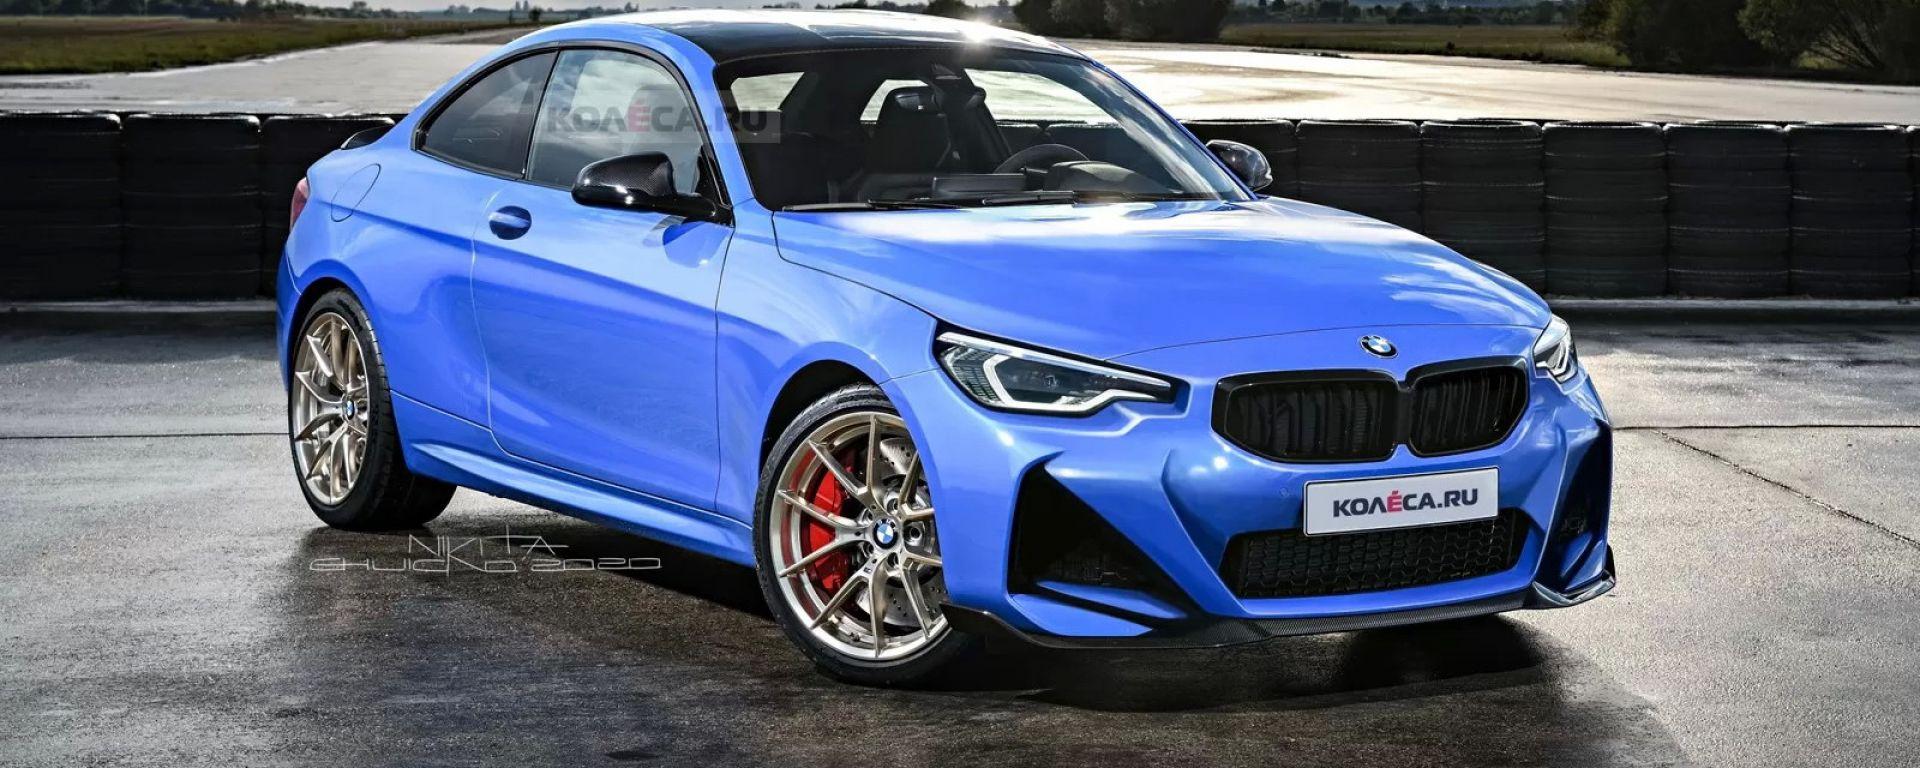 BMW Serie 2 Coupé 2021: rendering di Nikita Chuyko